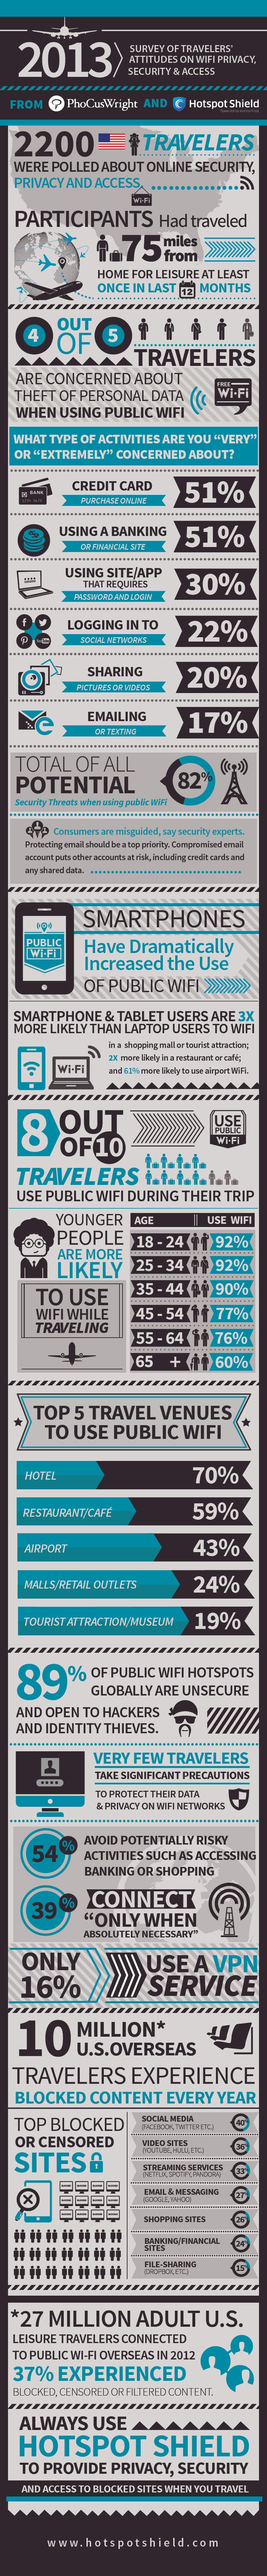 Public Wi-Fi infographic